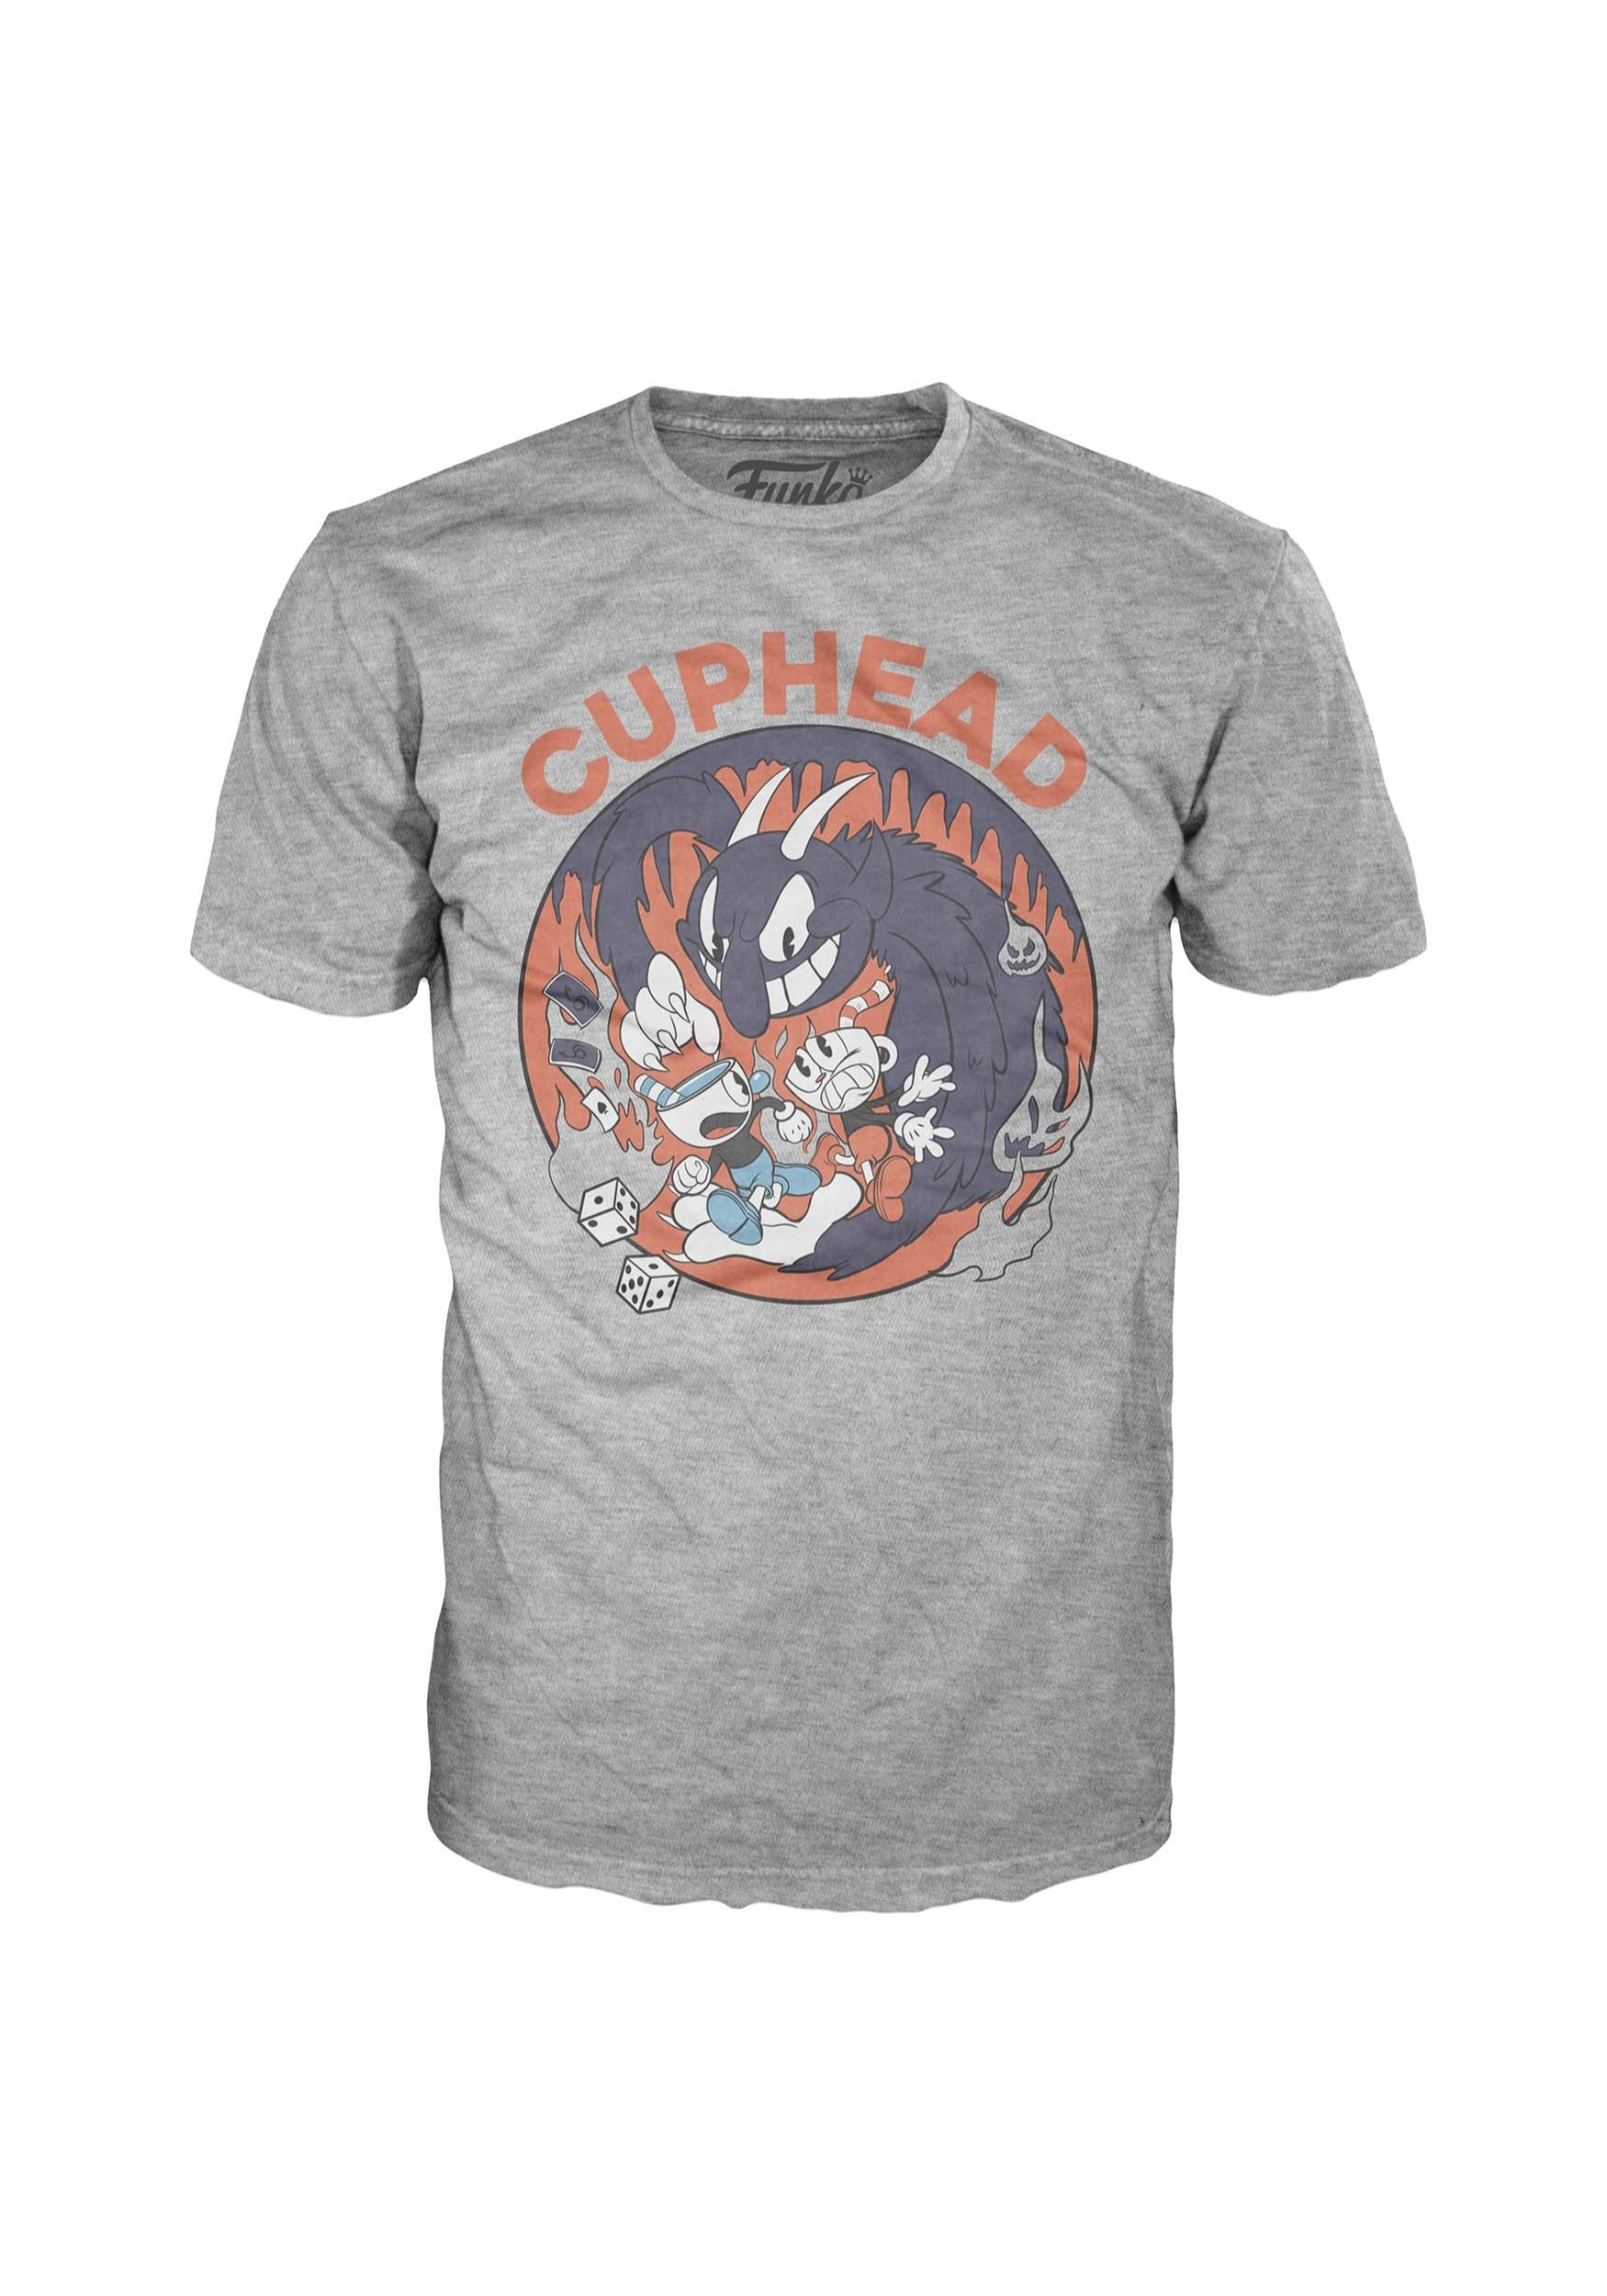 c9864b05 Pop! Tees: Cuphead Mugman Devil Adult Tee Shirt